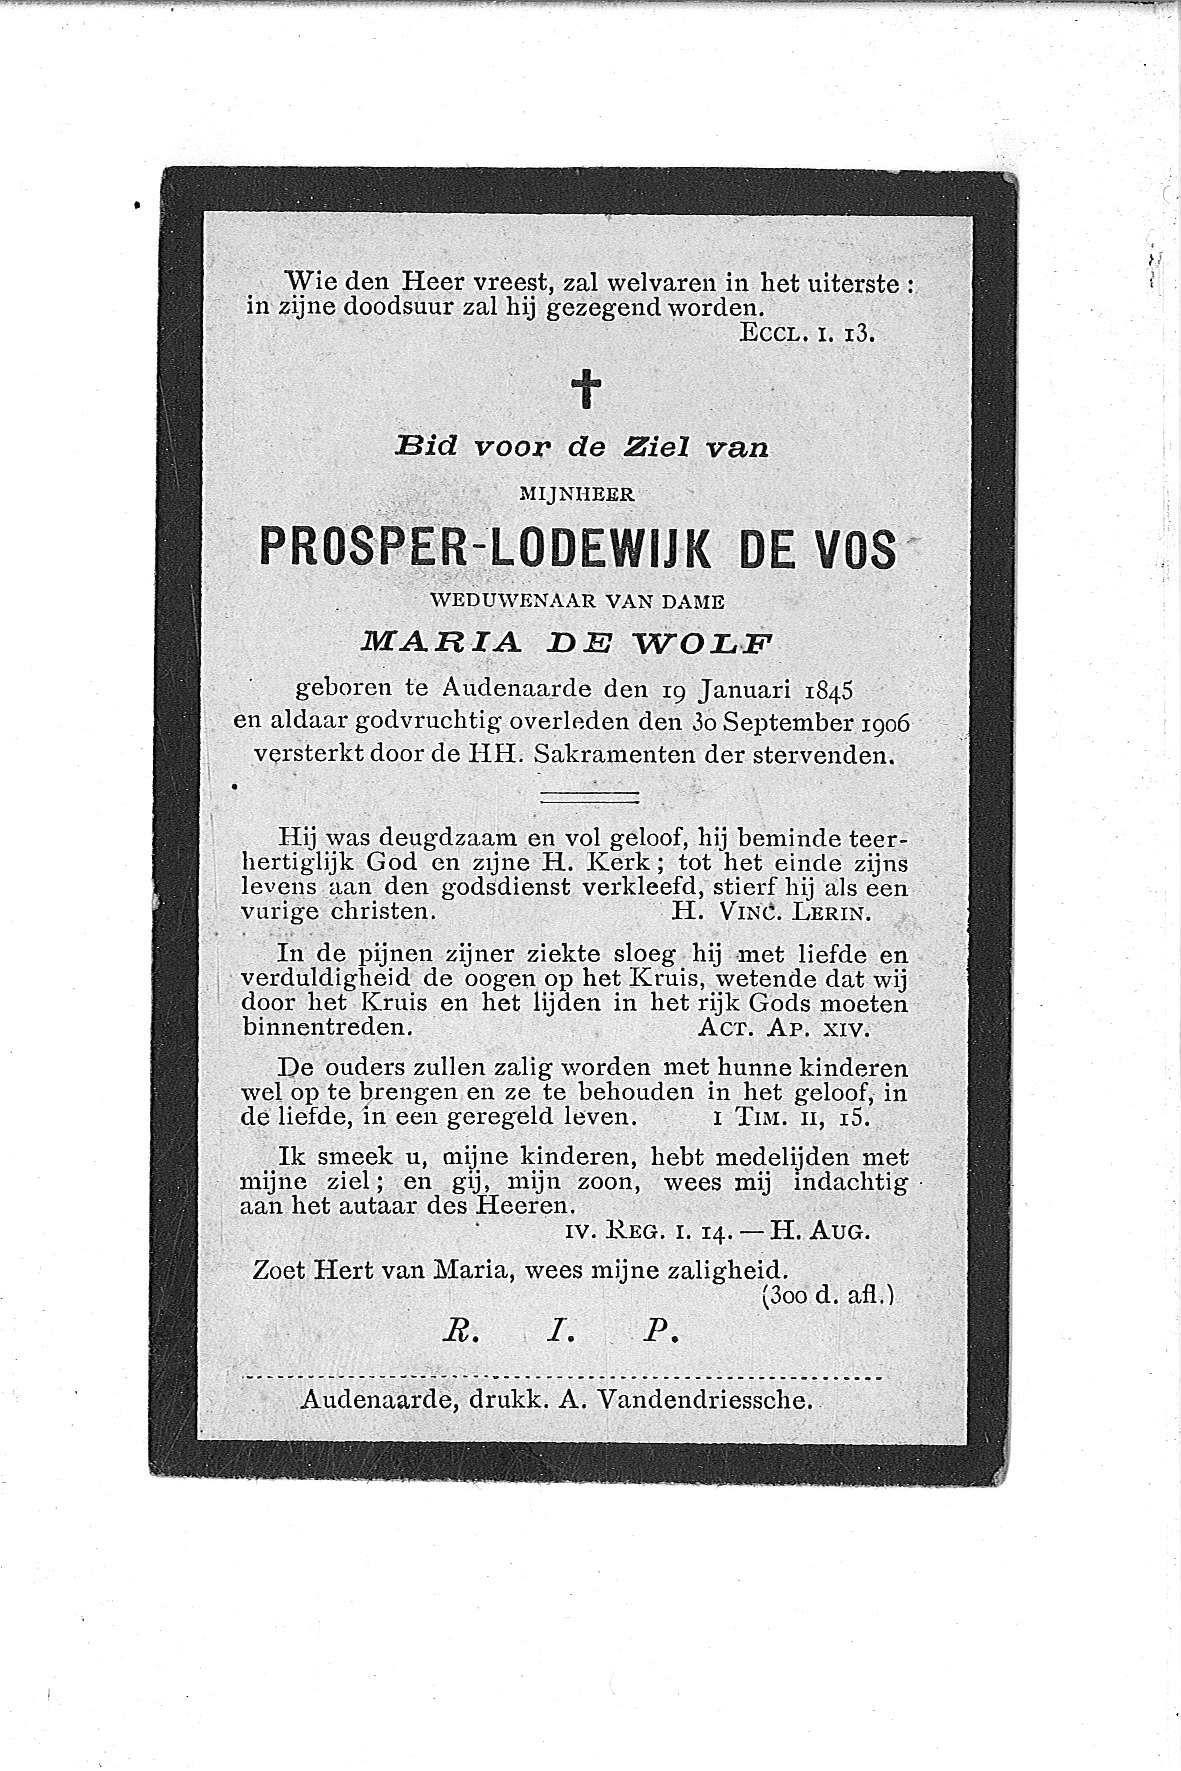 Prosper-Lodewijk (1906) 20120306152925_00069.jpg